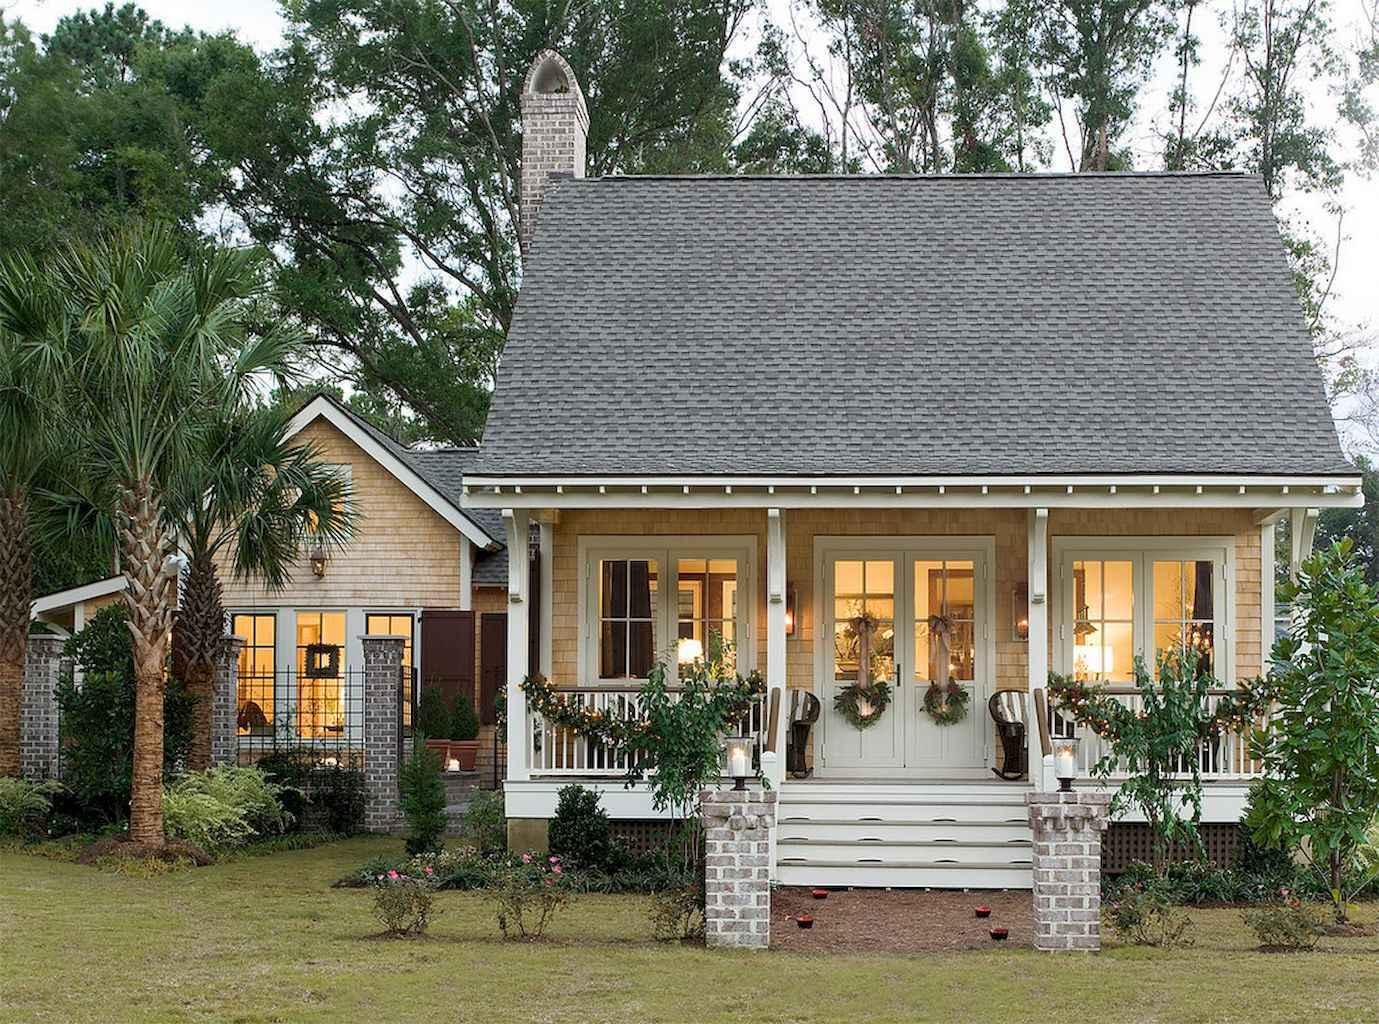 60 amazing farmhouse plans cracker style design ideas (22)